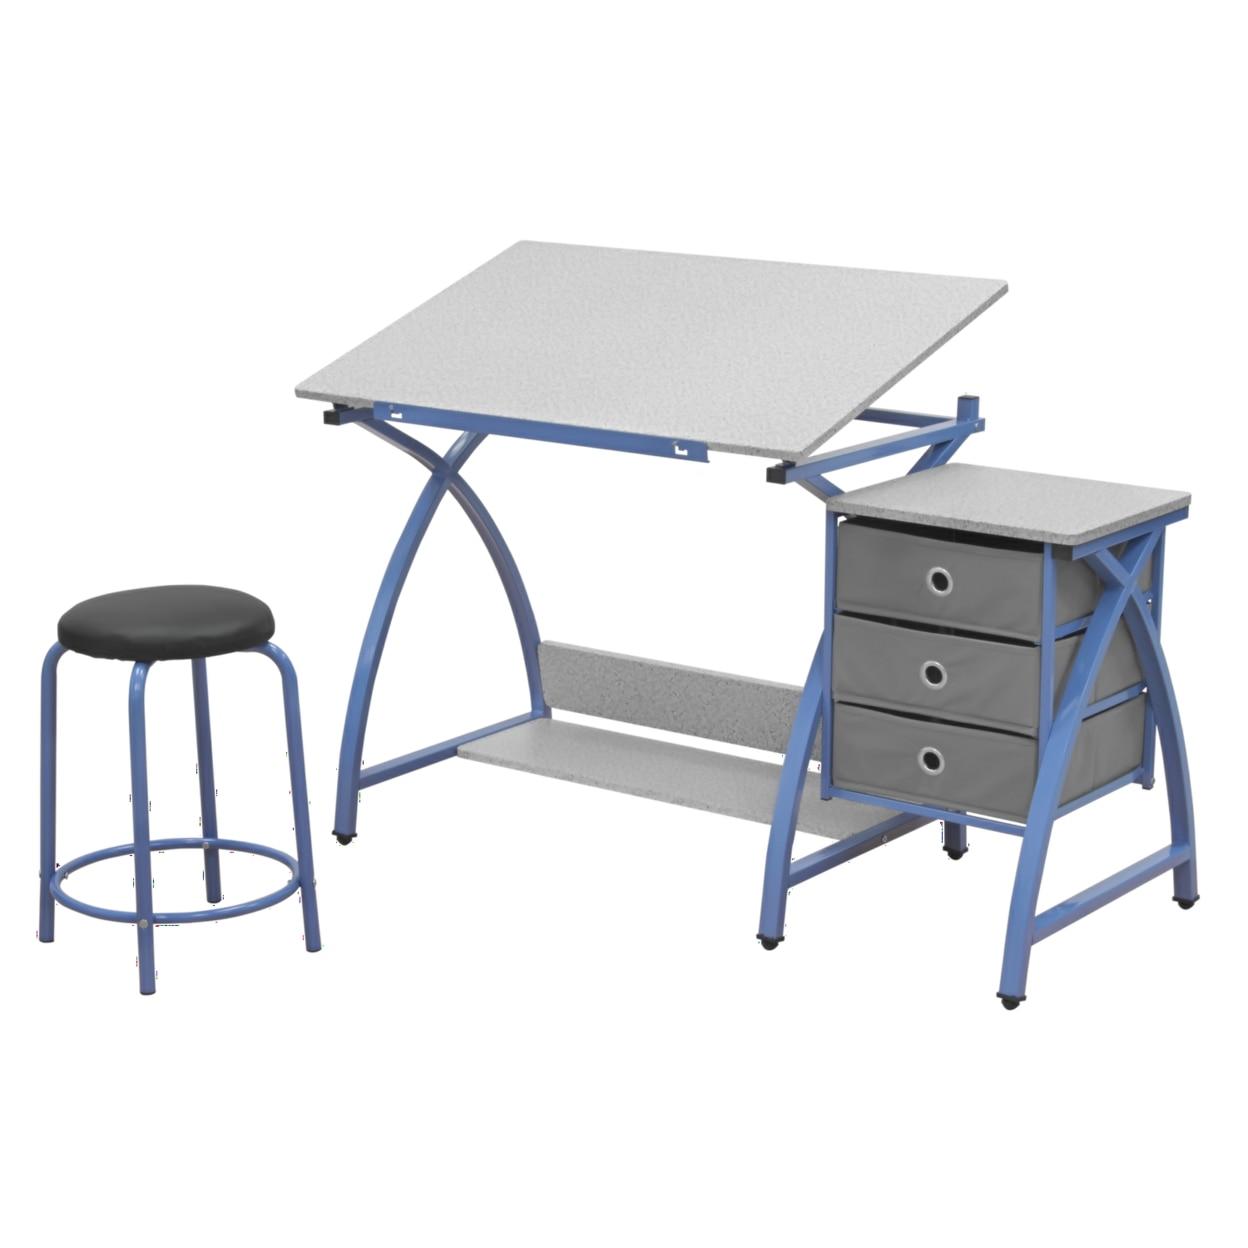 Studio Designs Home Office Comet Center with Stool - Blue/Spatter Gray игрушка ecx ruckus gray blue ecx00013t1